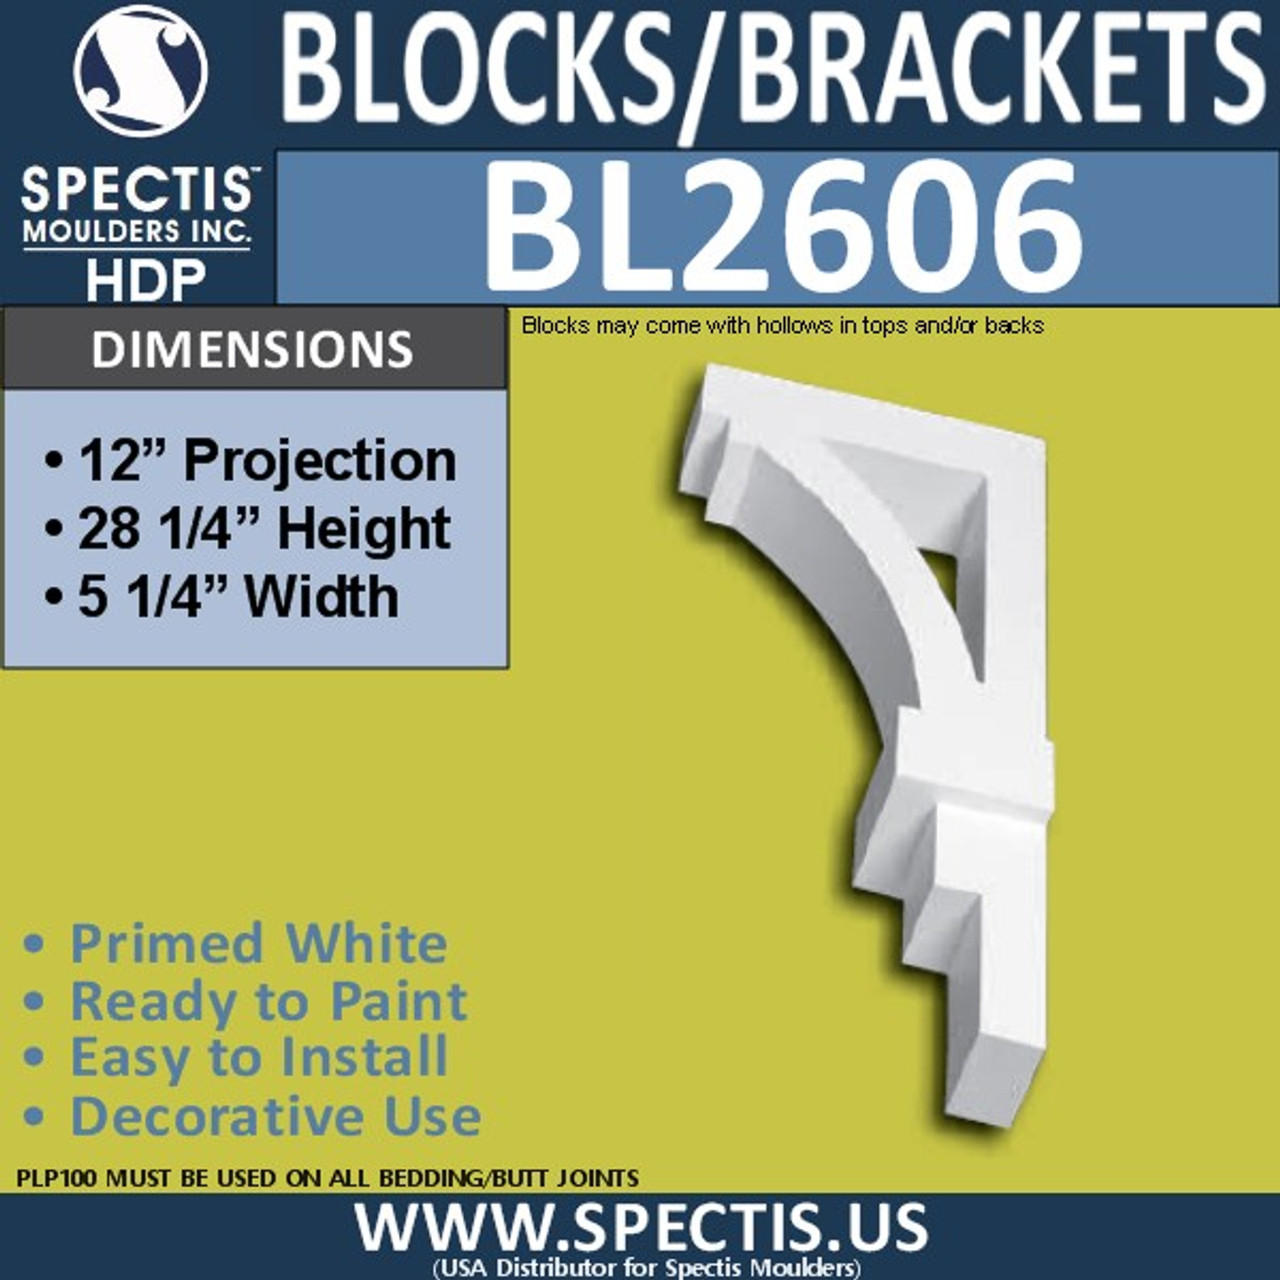 "BL2606 Eave Block or Bracket 5.25""W x 28.25""H x 12"" P"